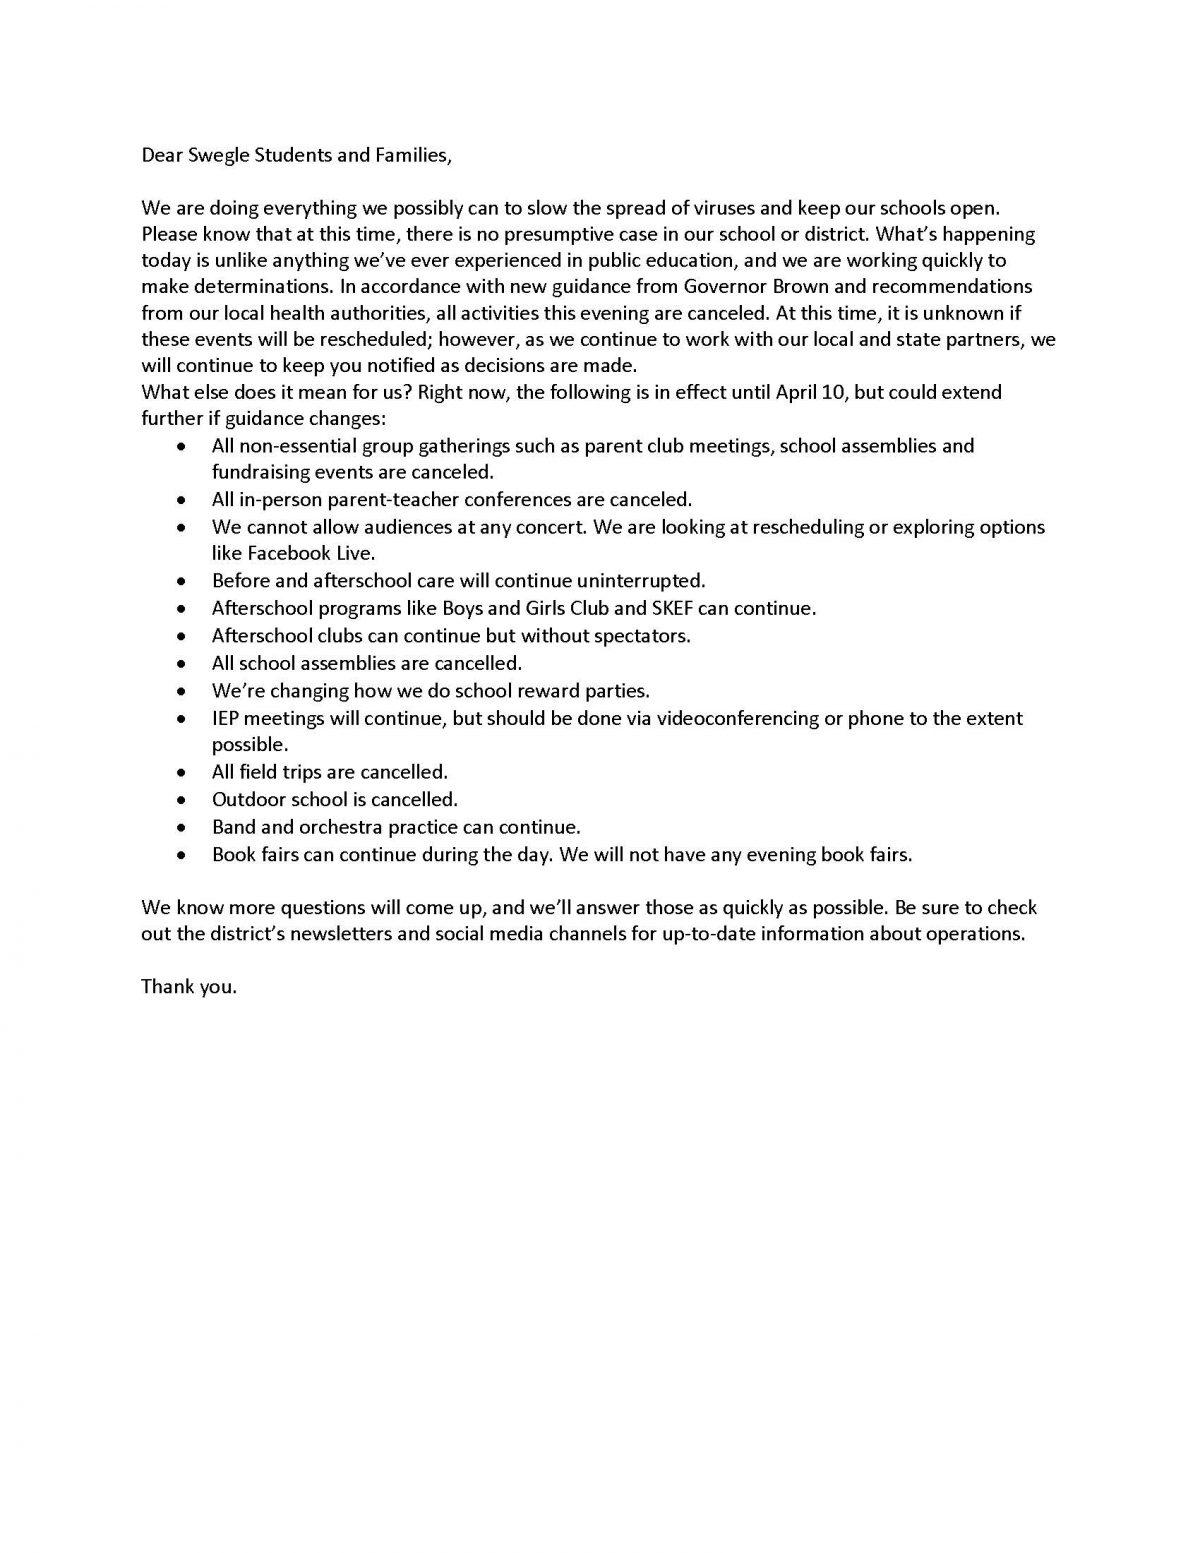 English COVID-19 Info